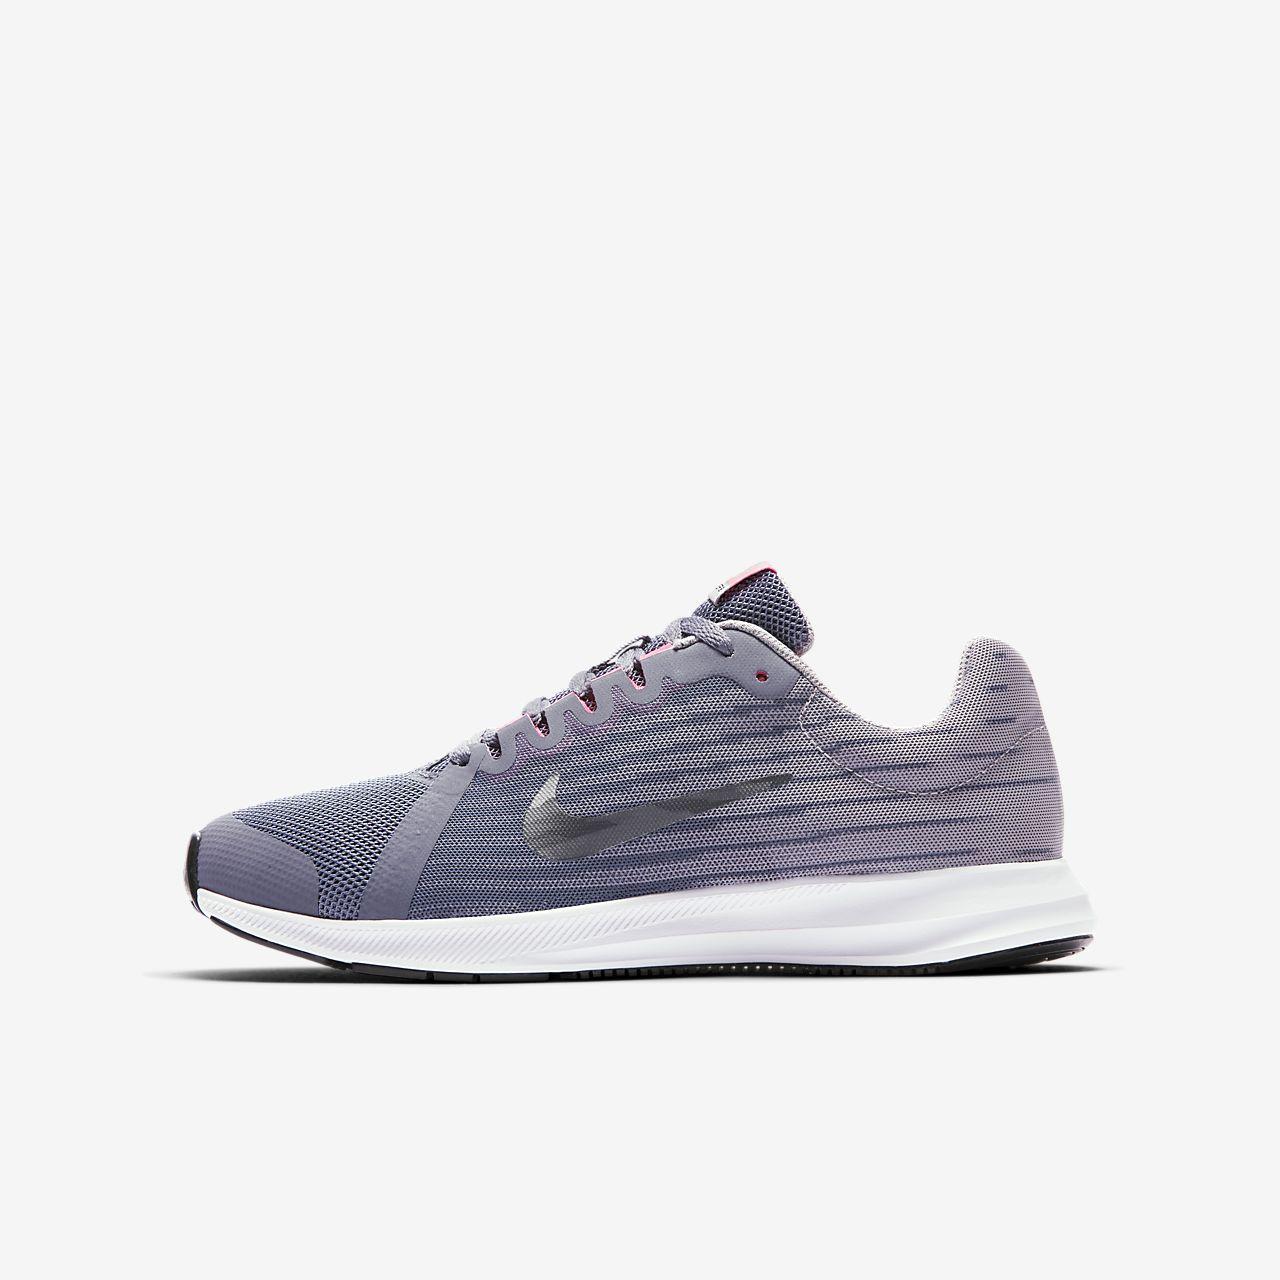 96498bd75ad5f Nike Downshifter 8 Zapatillas de running - Niño a. Nike.com ES